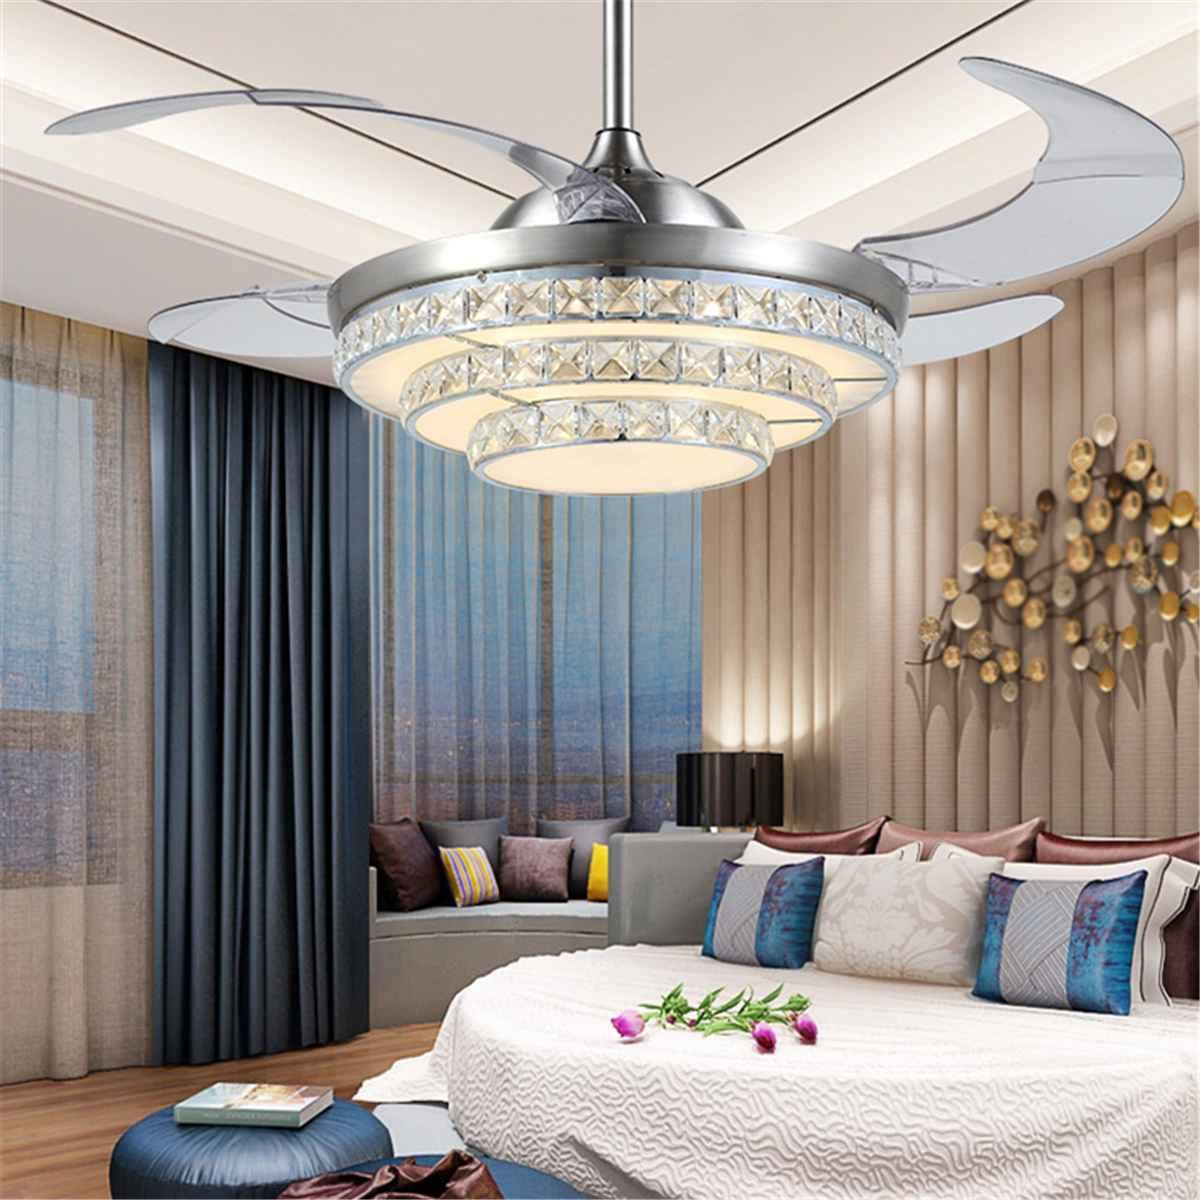 42 Inch Invisiable Crystal Ceiling Fan Light Modern Luxury Dining Room Ceiling Fan Lamp 4 Fan Blade Remote Control Ventilador